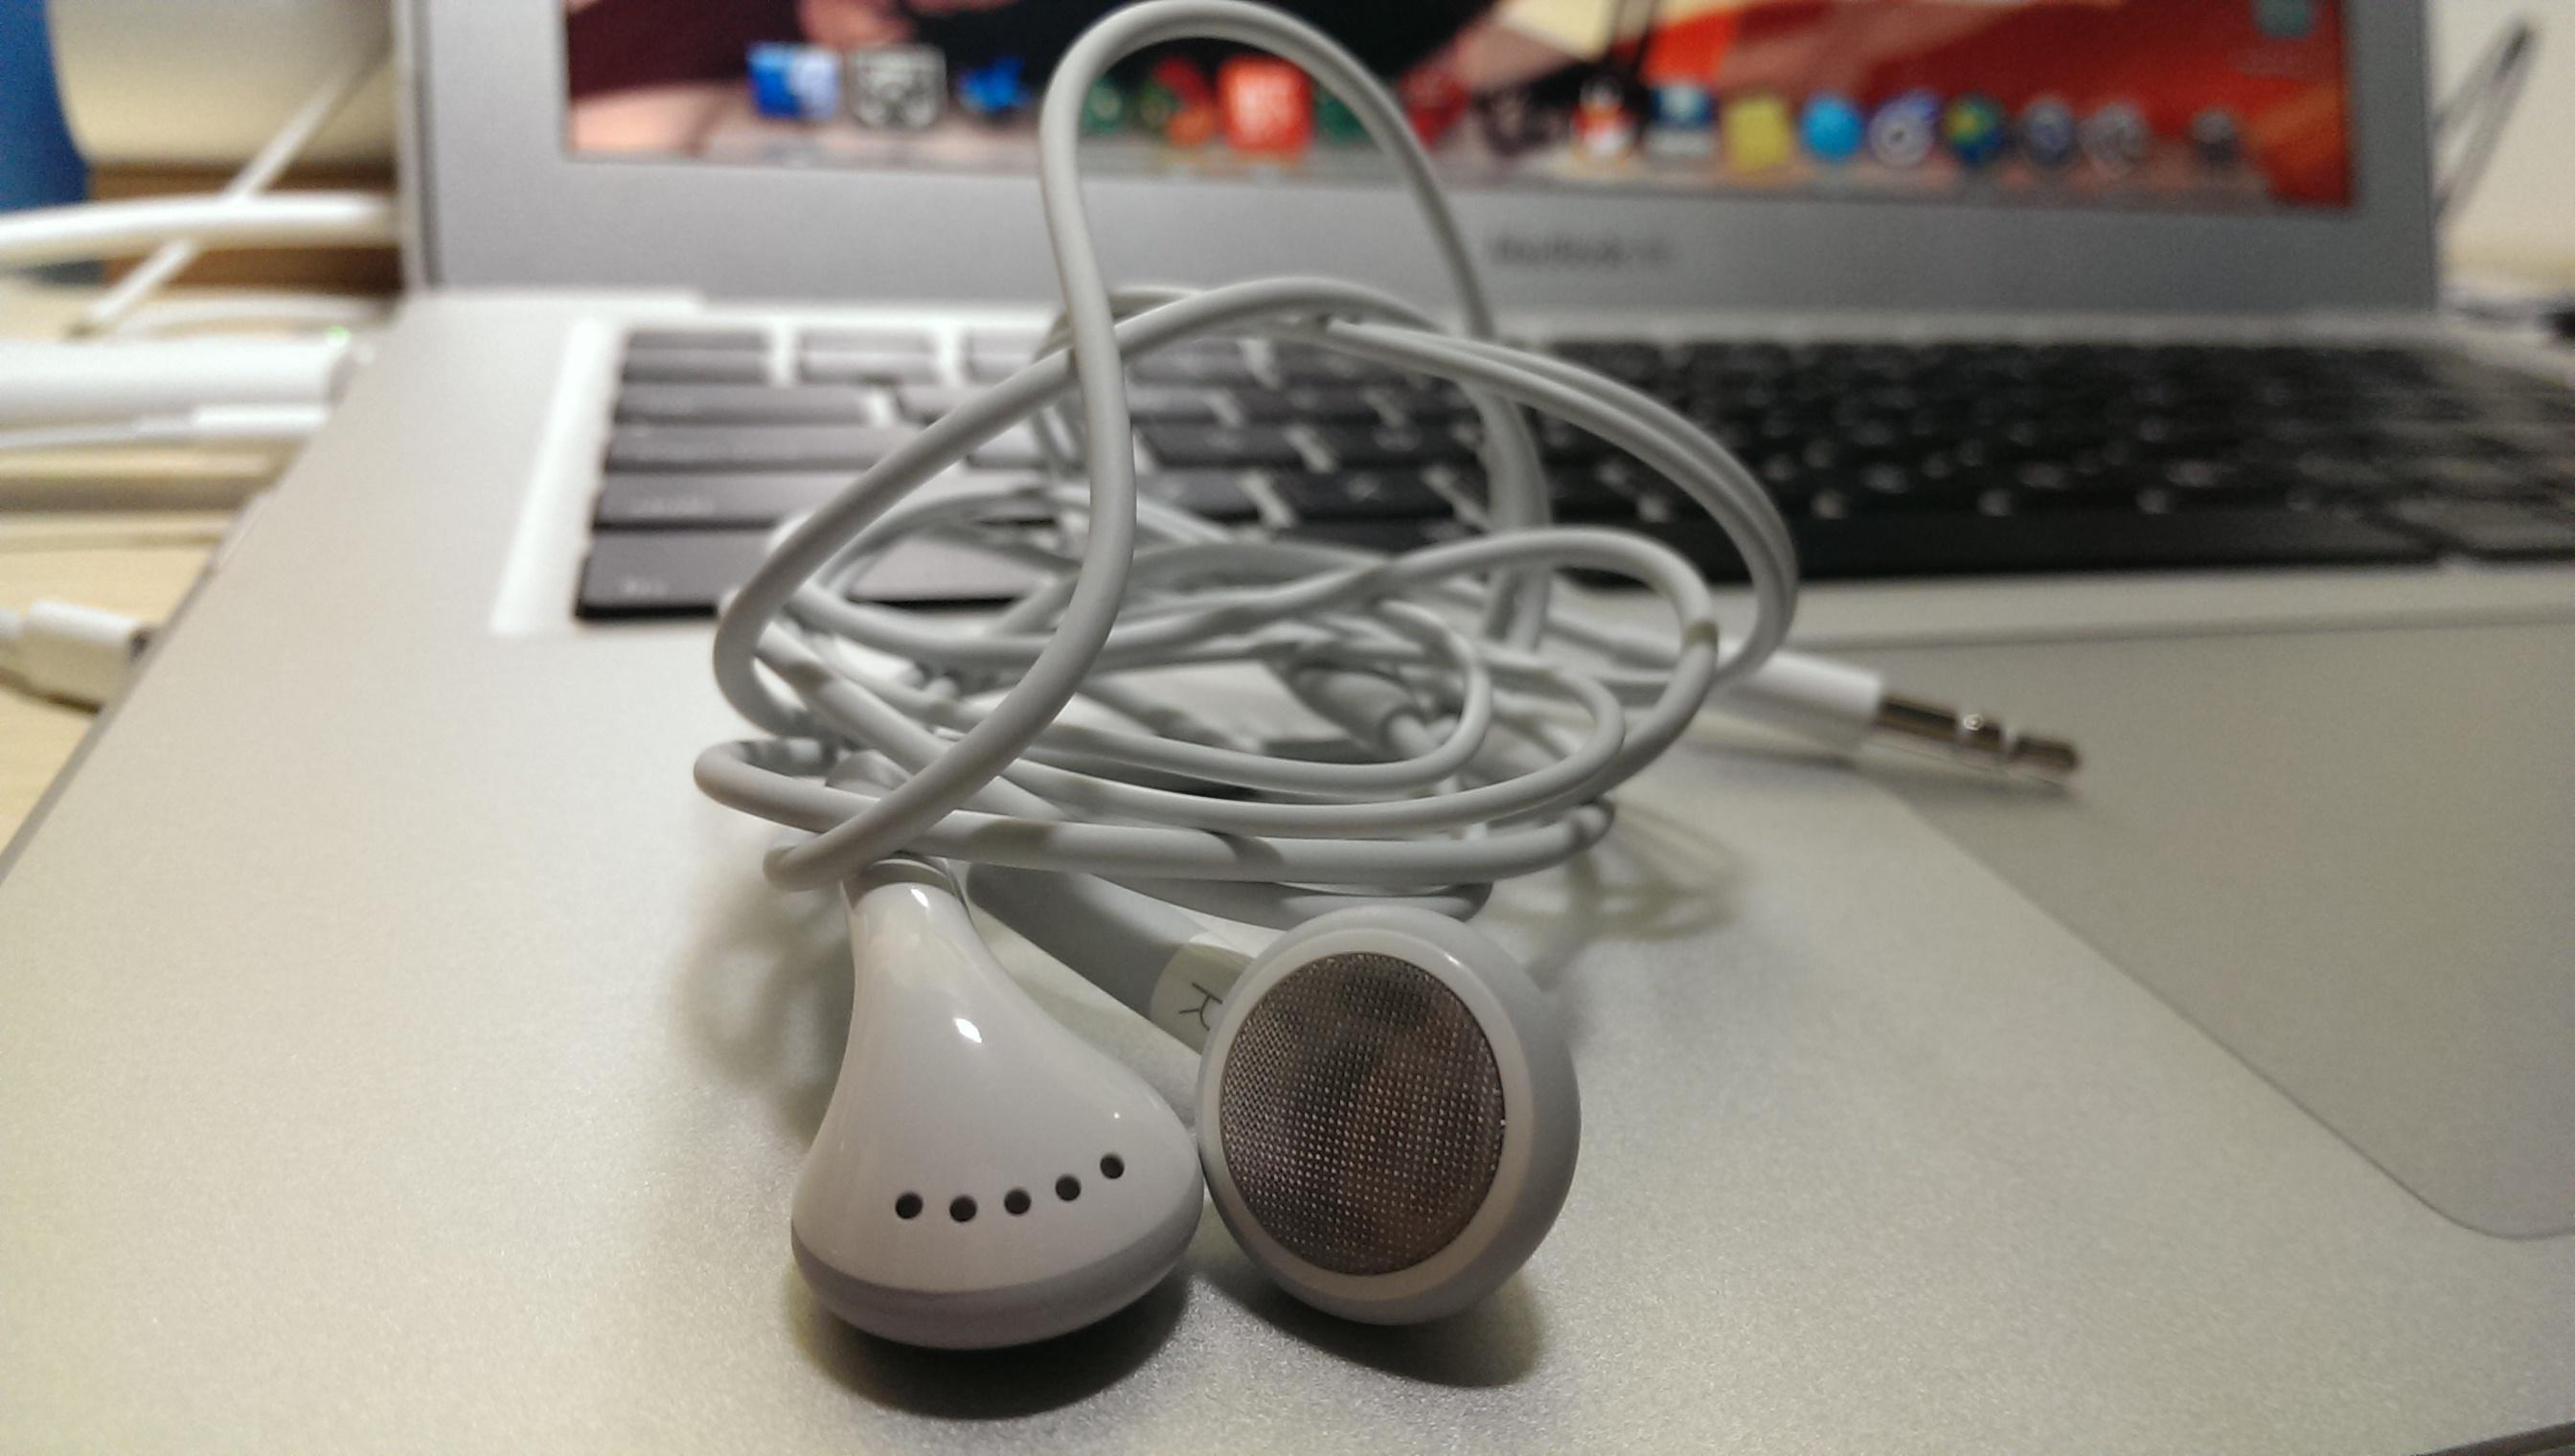 Apple Macbook, Computer, Electronic, Headphone, Ipod, HQ Photo